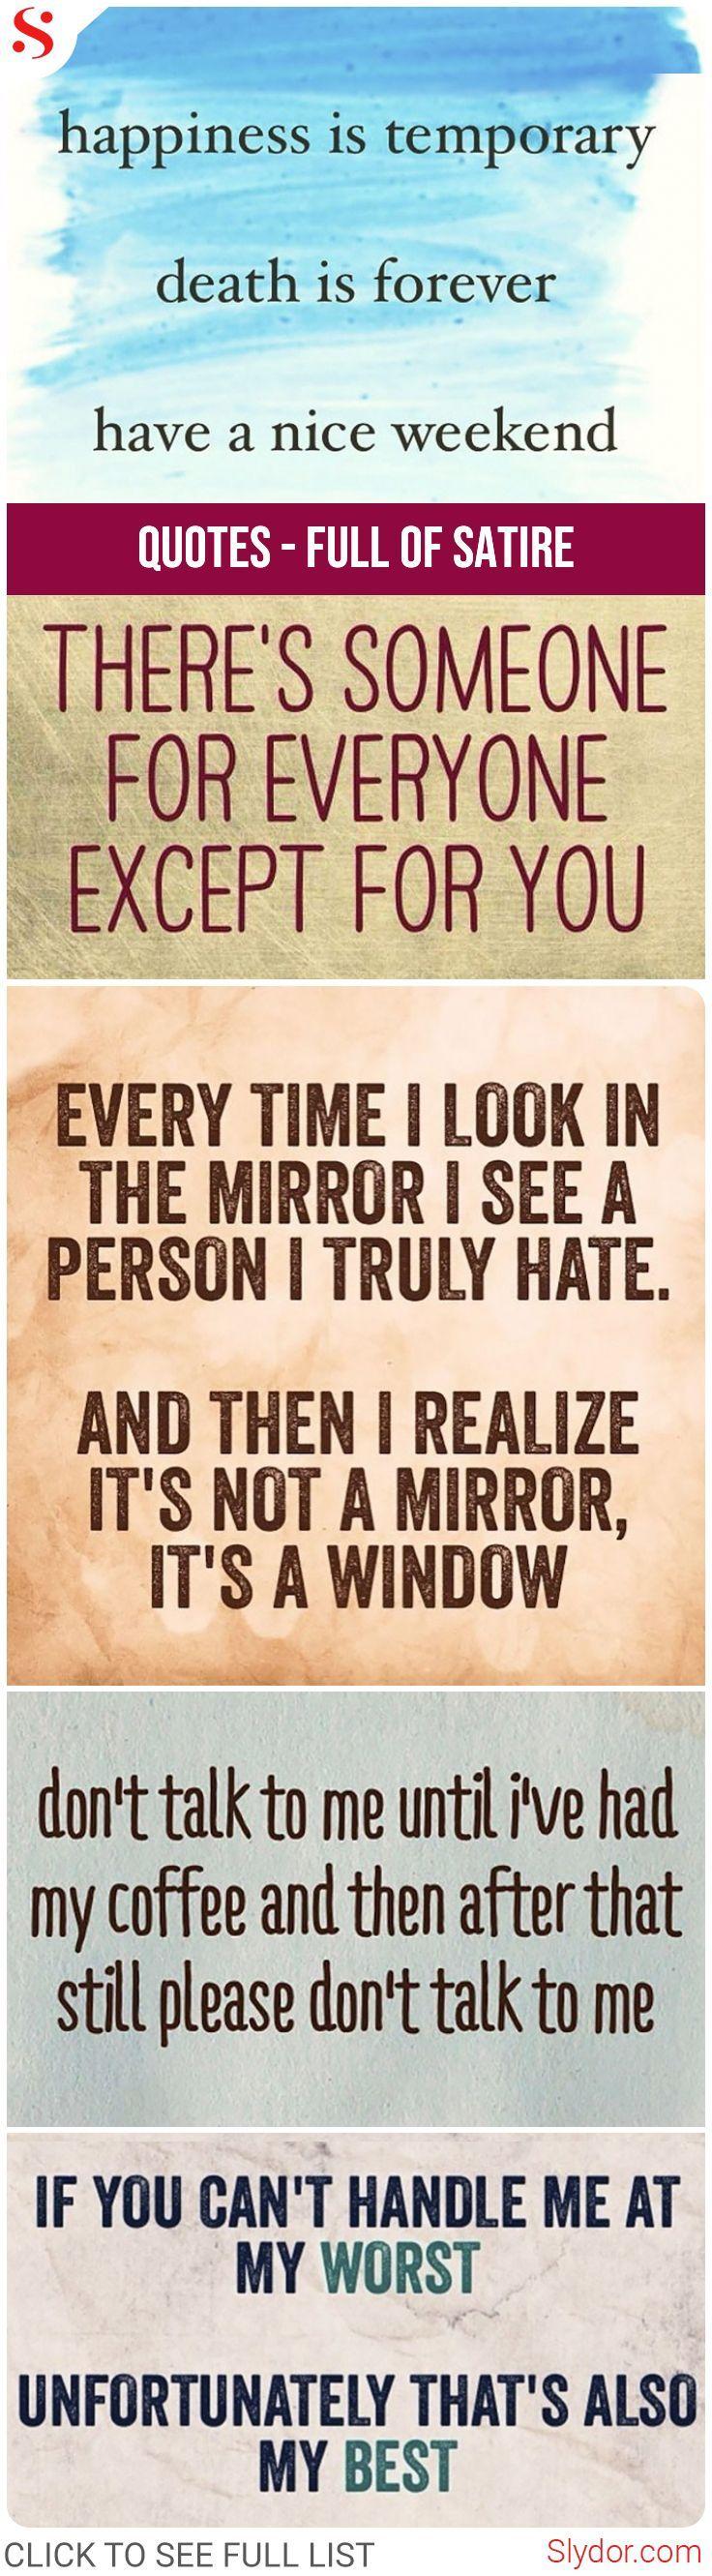 Quotes Full Of Satire Funny Quotes Funnyquotes Creativity Satire Inspirational Dailydoseoffun Quotes Weekend Quotes Daily Motivational Quotes